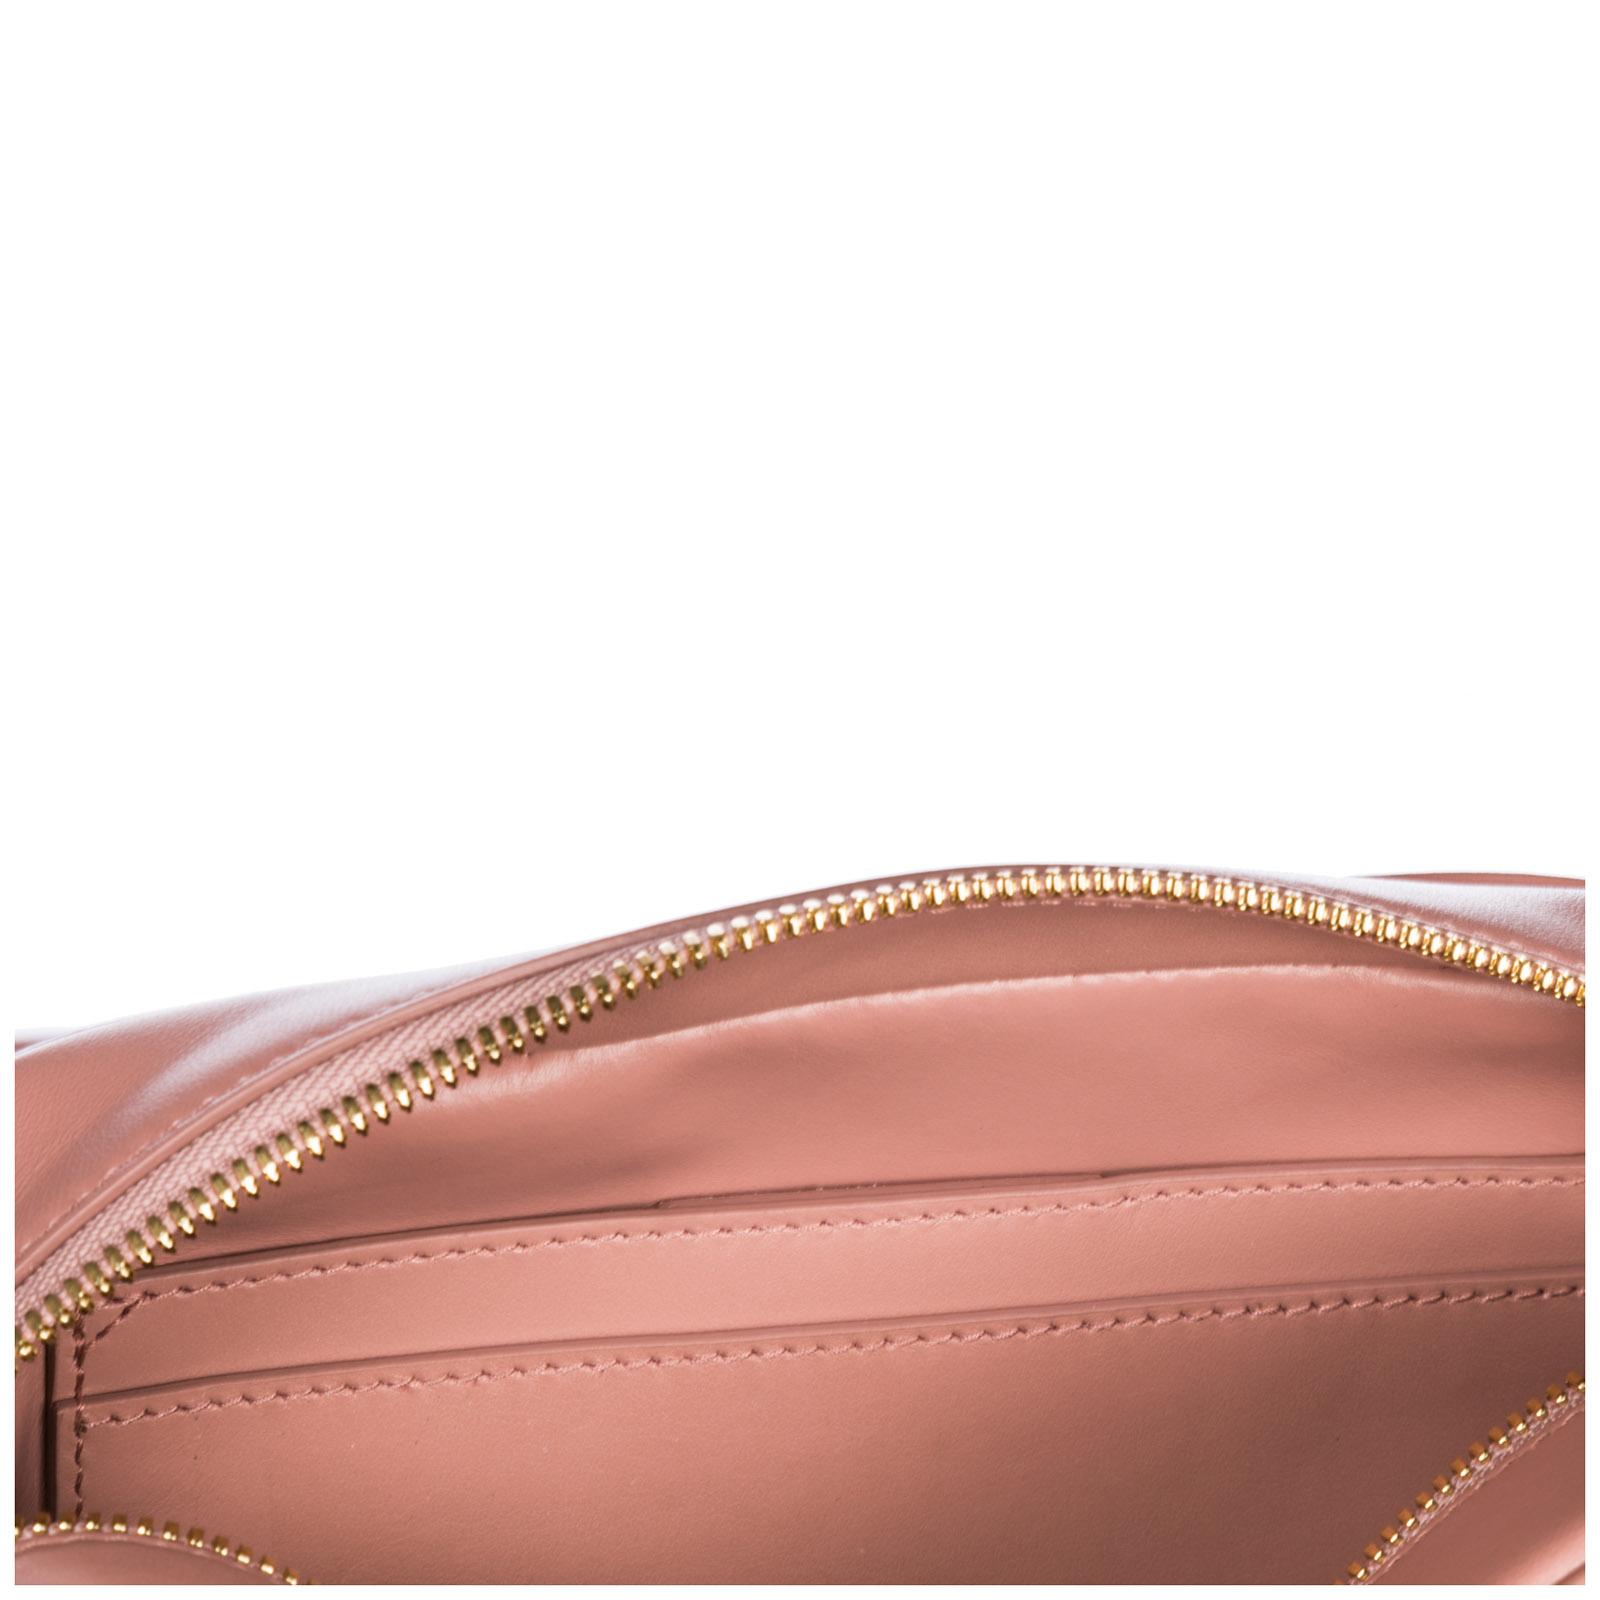 0aa2b508c11e ... Women s leather cross-body messenger shoulder bag camera bag gancini